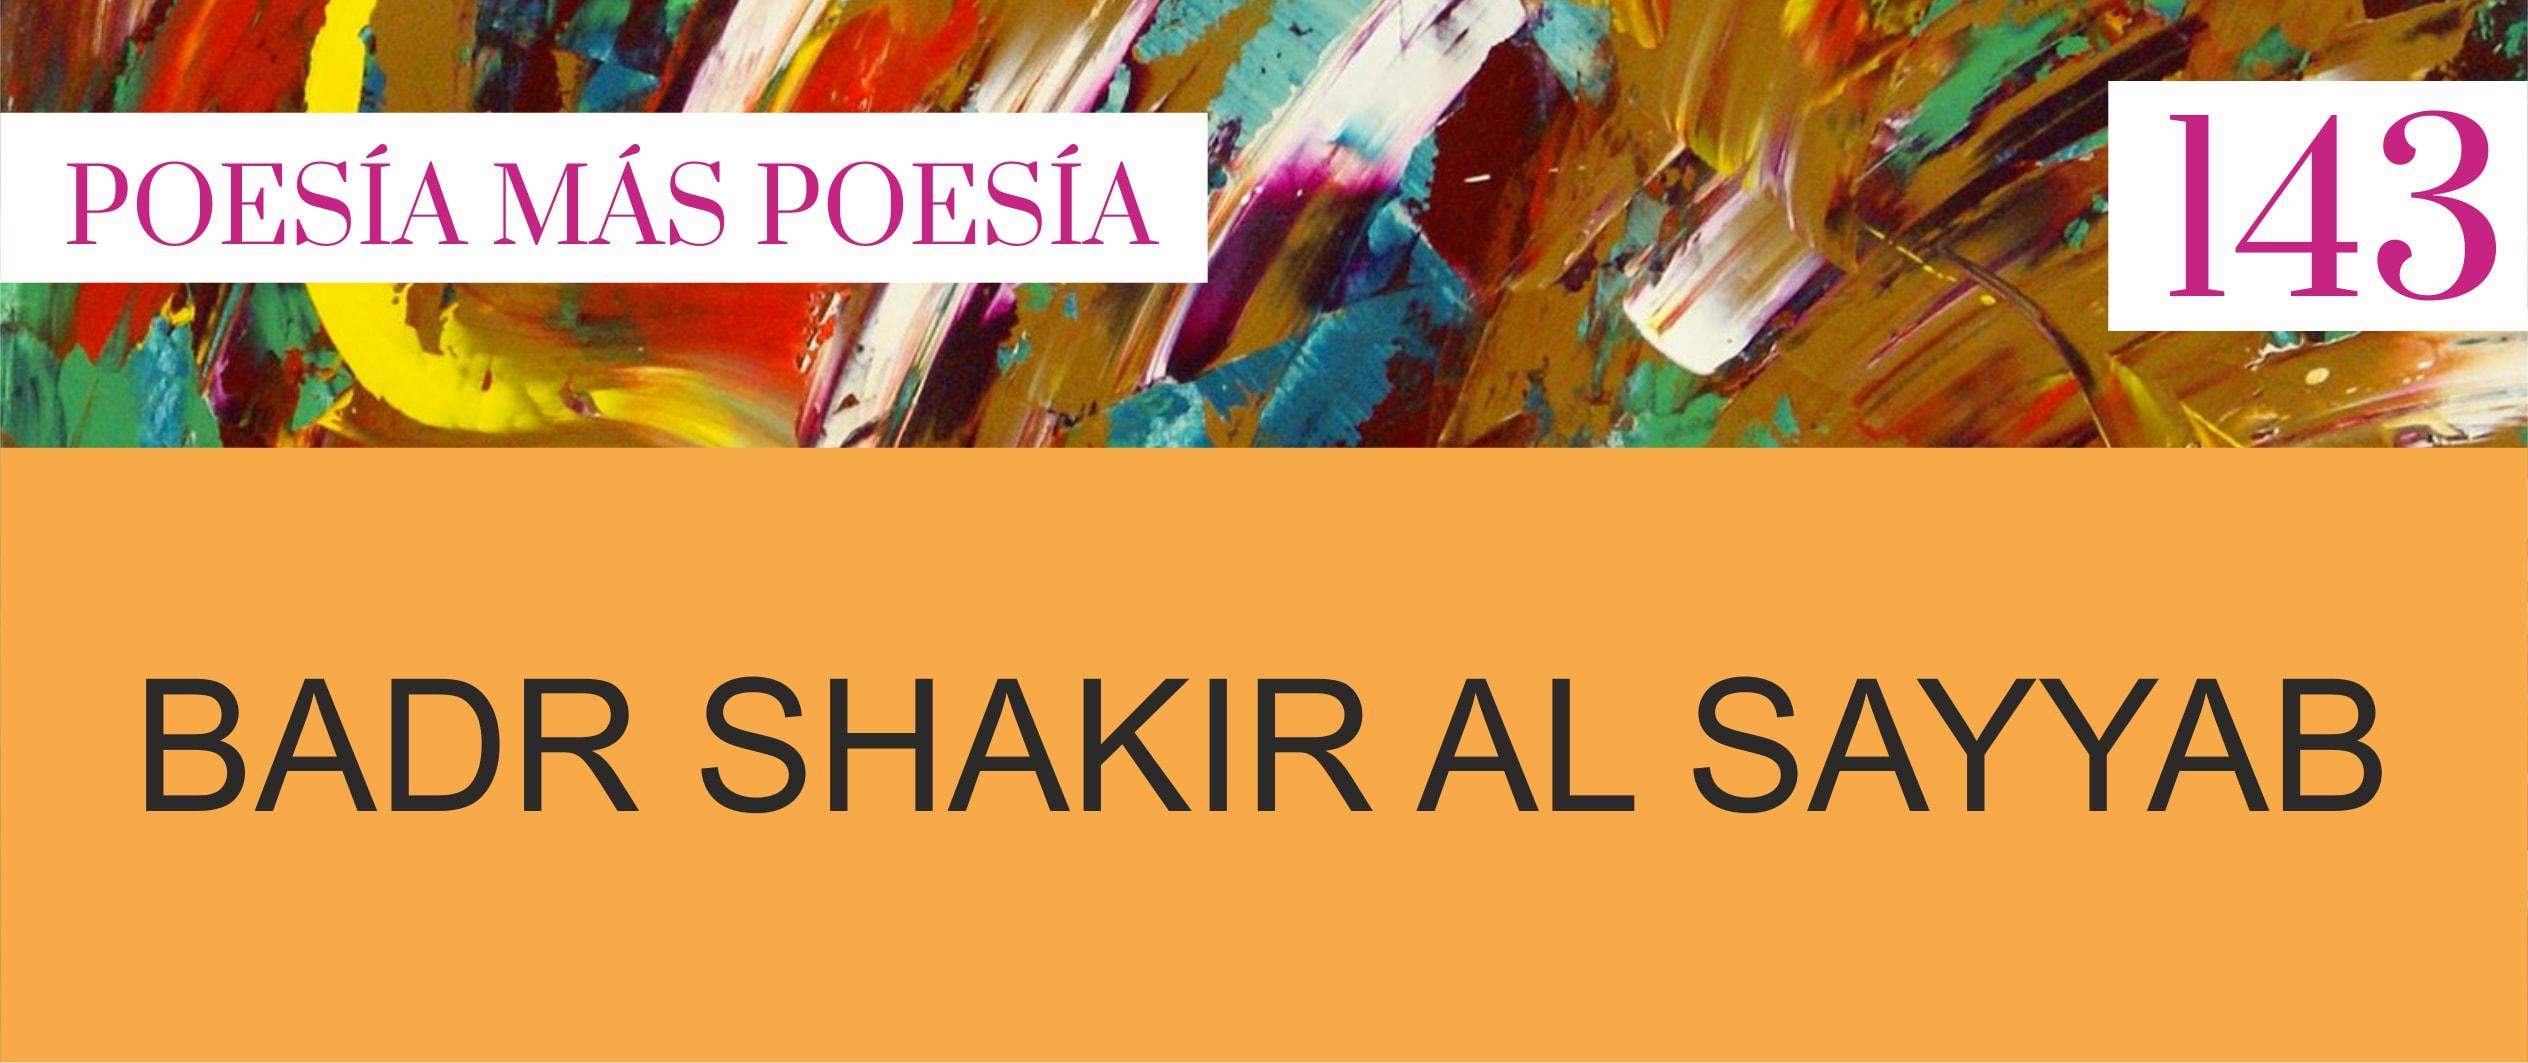 143. Poesía más Poesía: Badr Shakir Al Sayyab